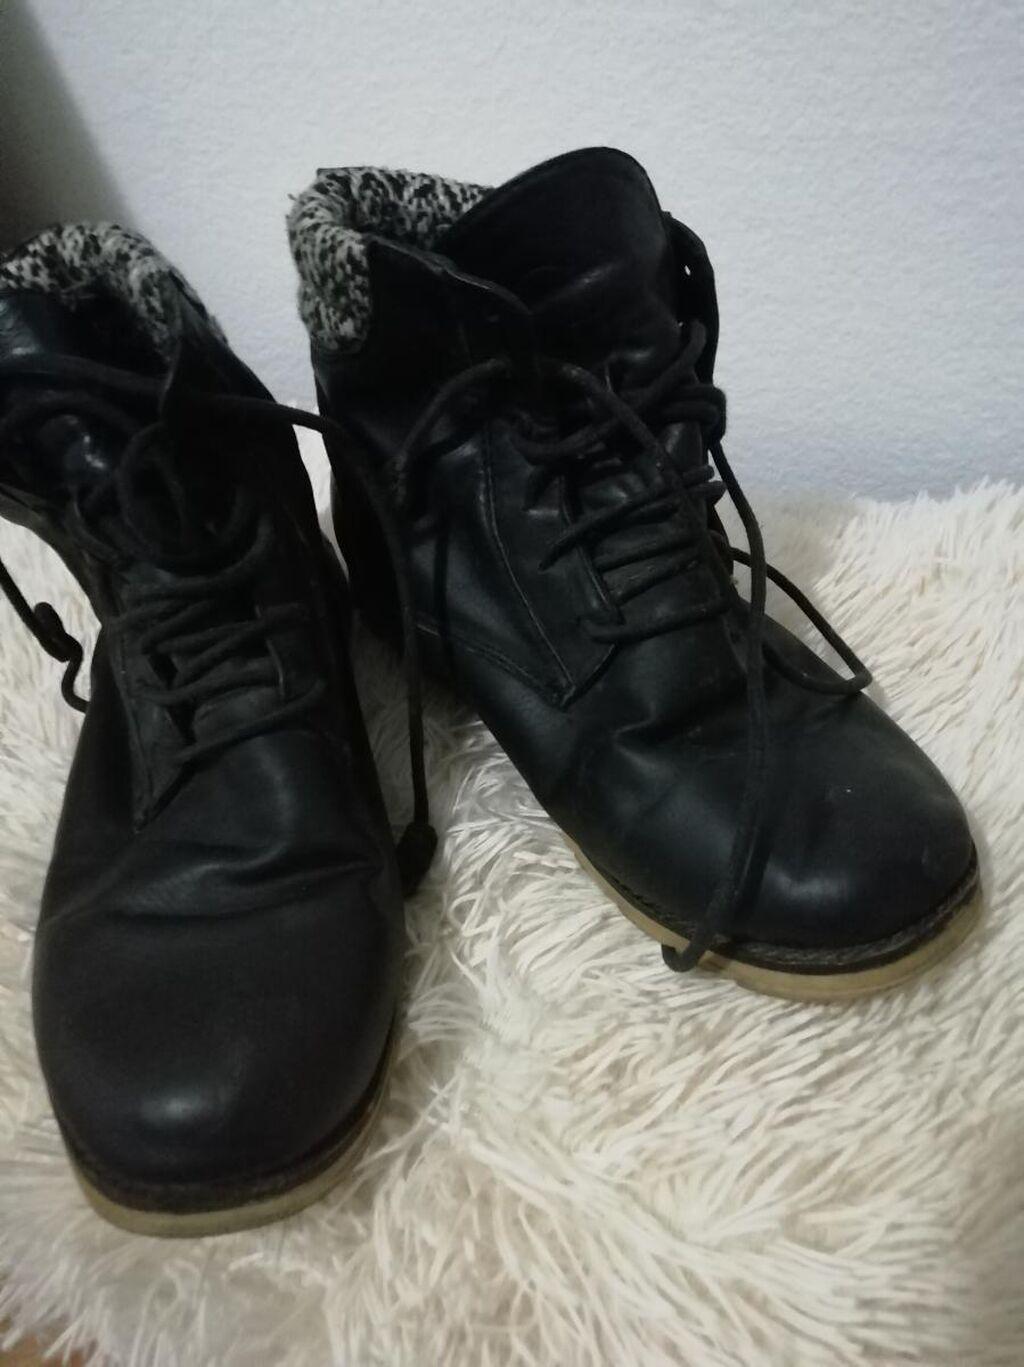 Duboke cipele br 39